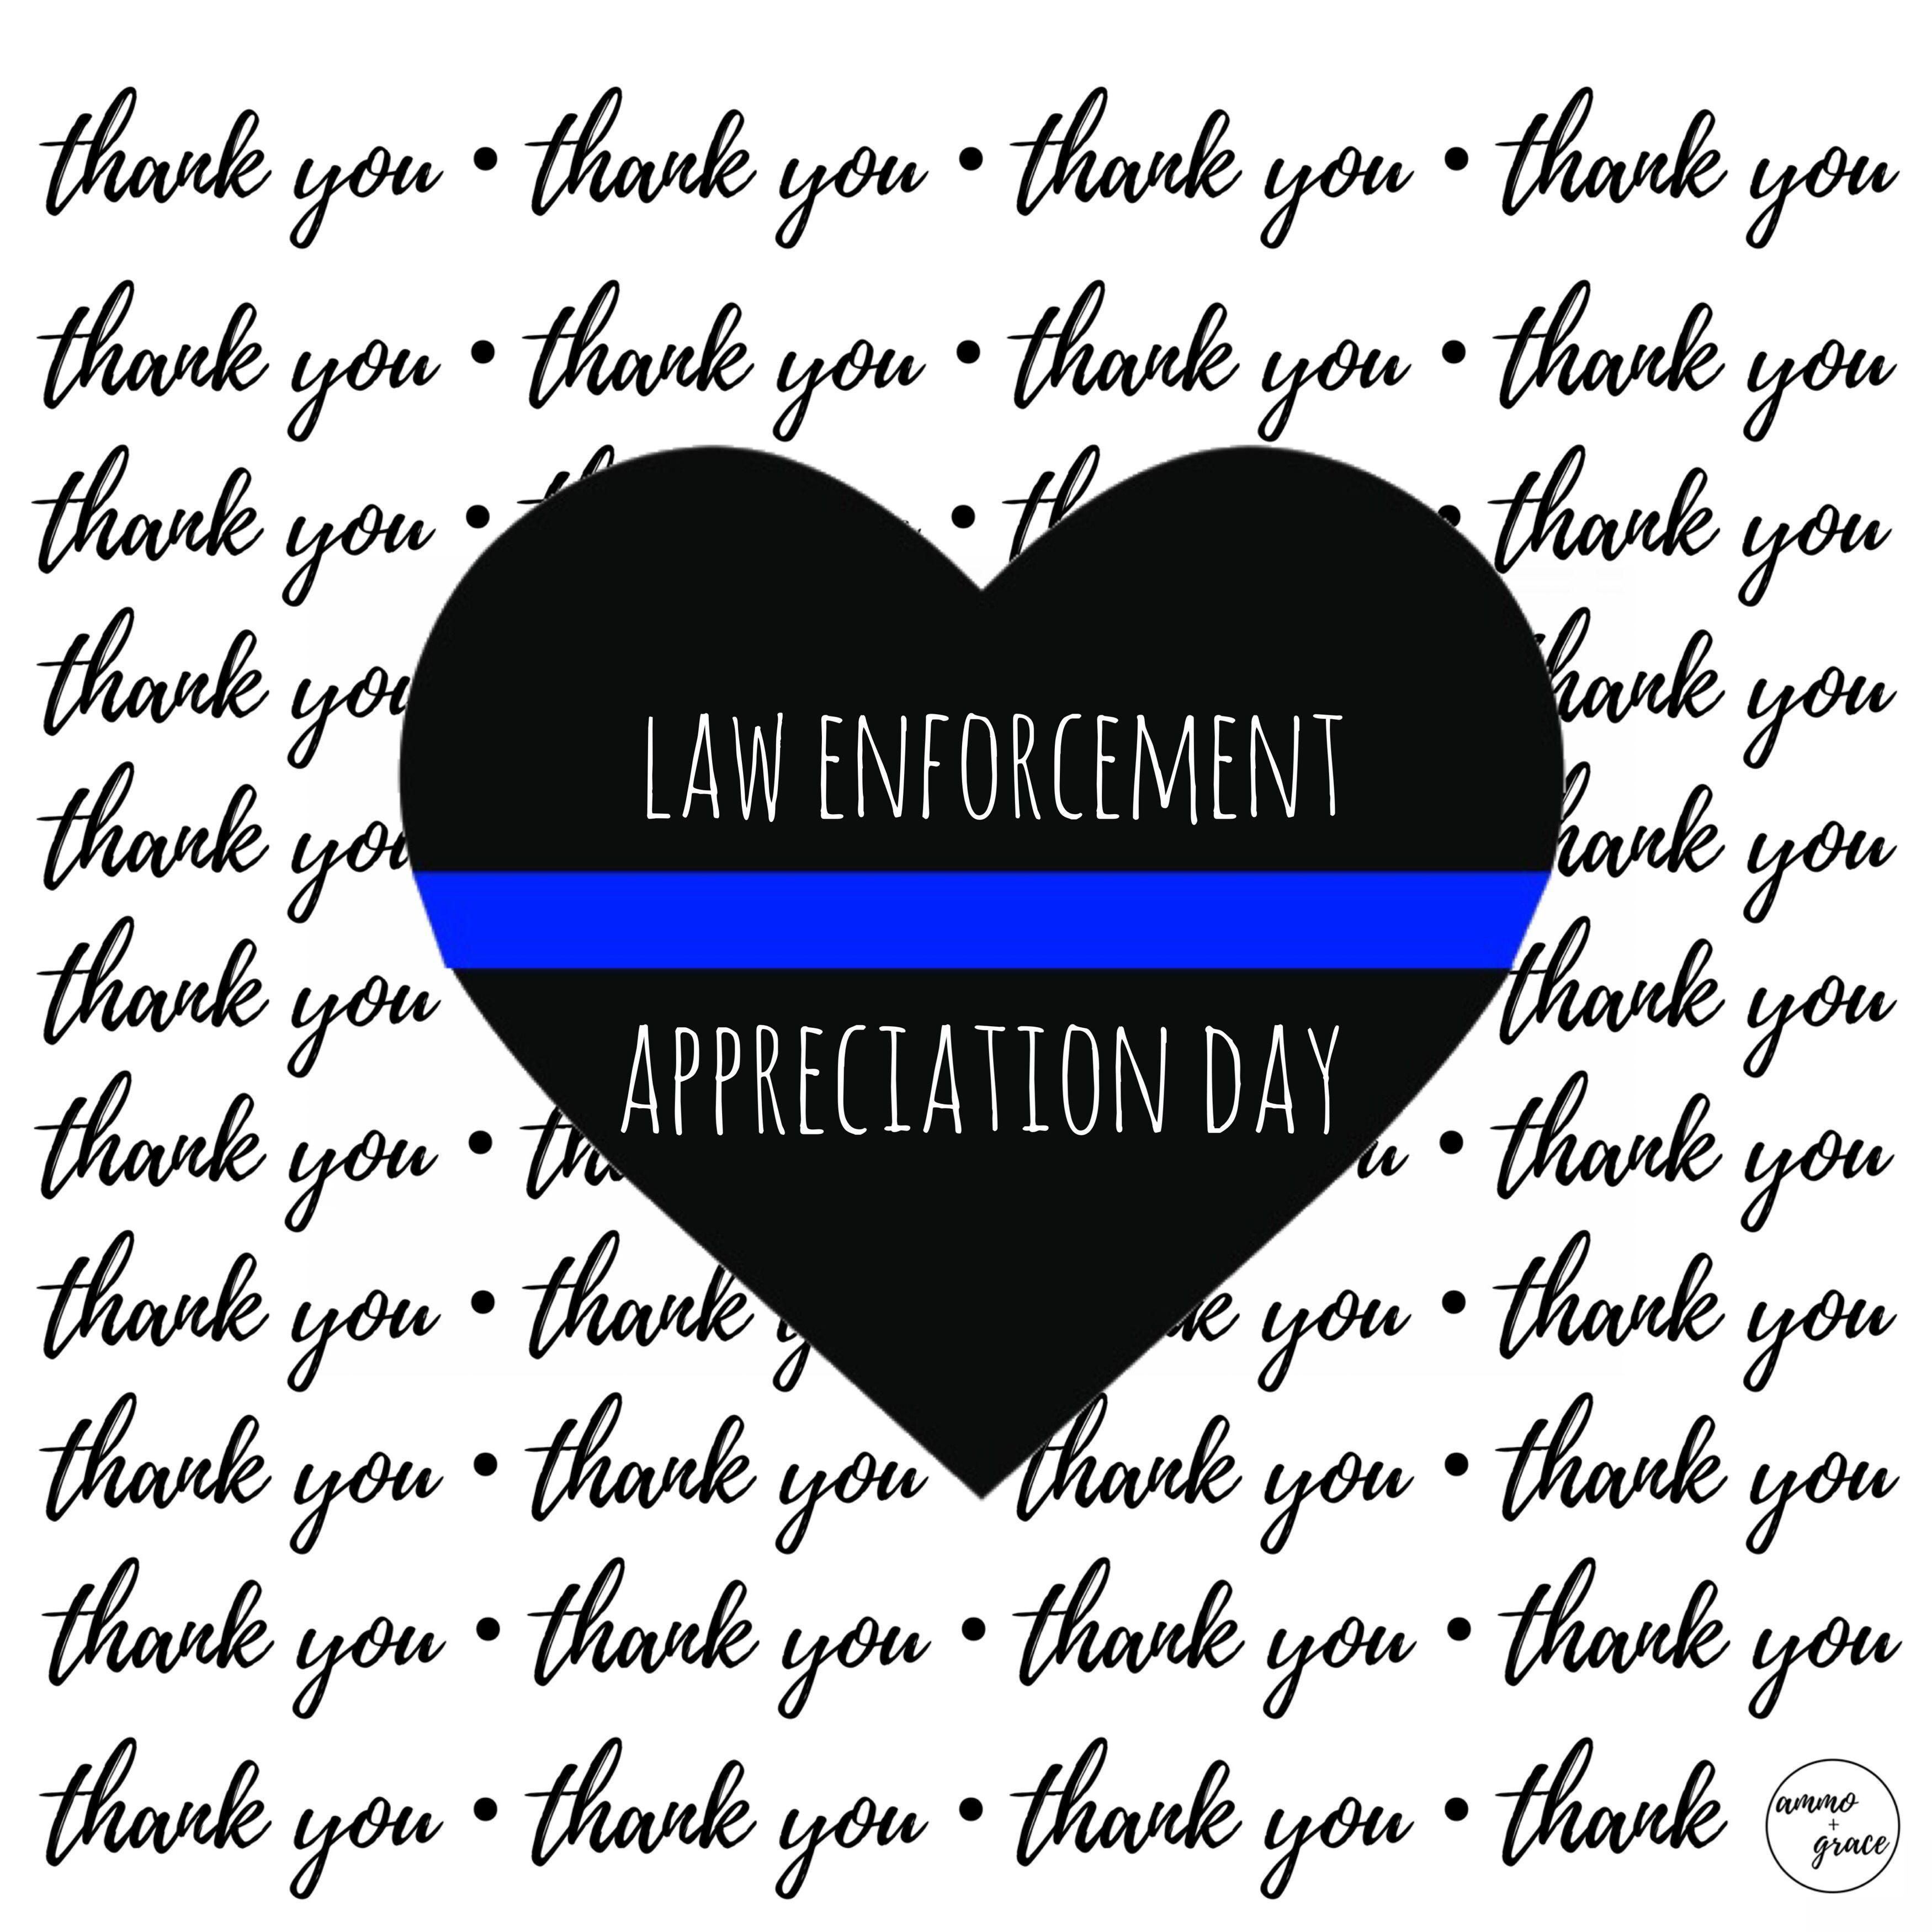 Law Enforcement Appreciation Day ���